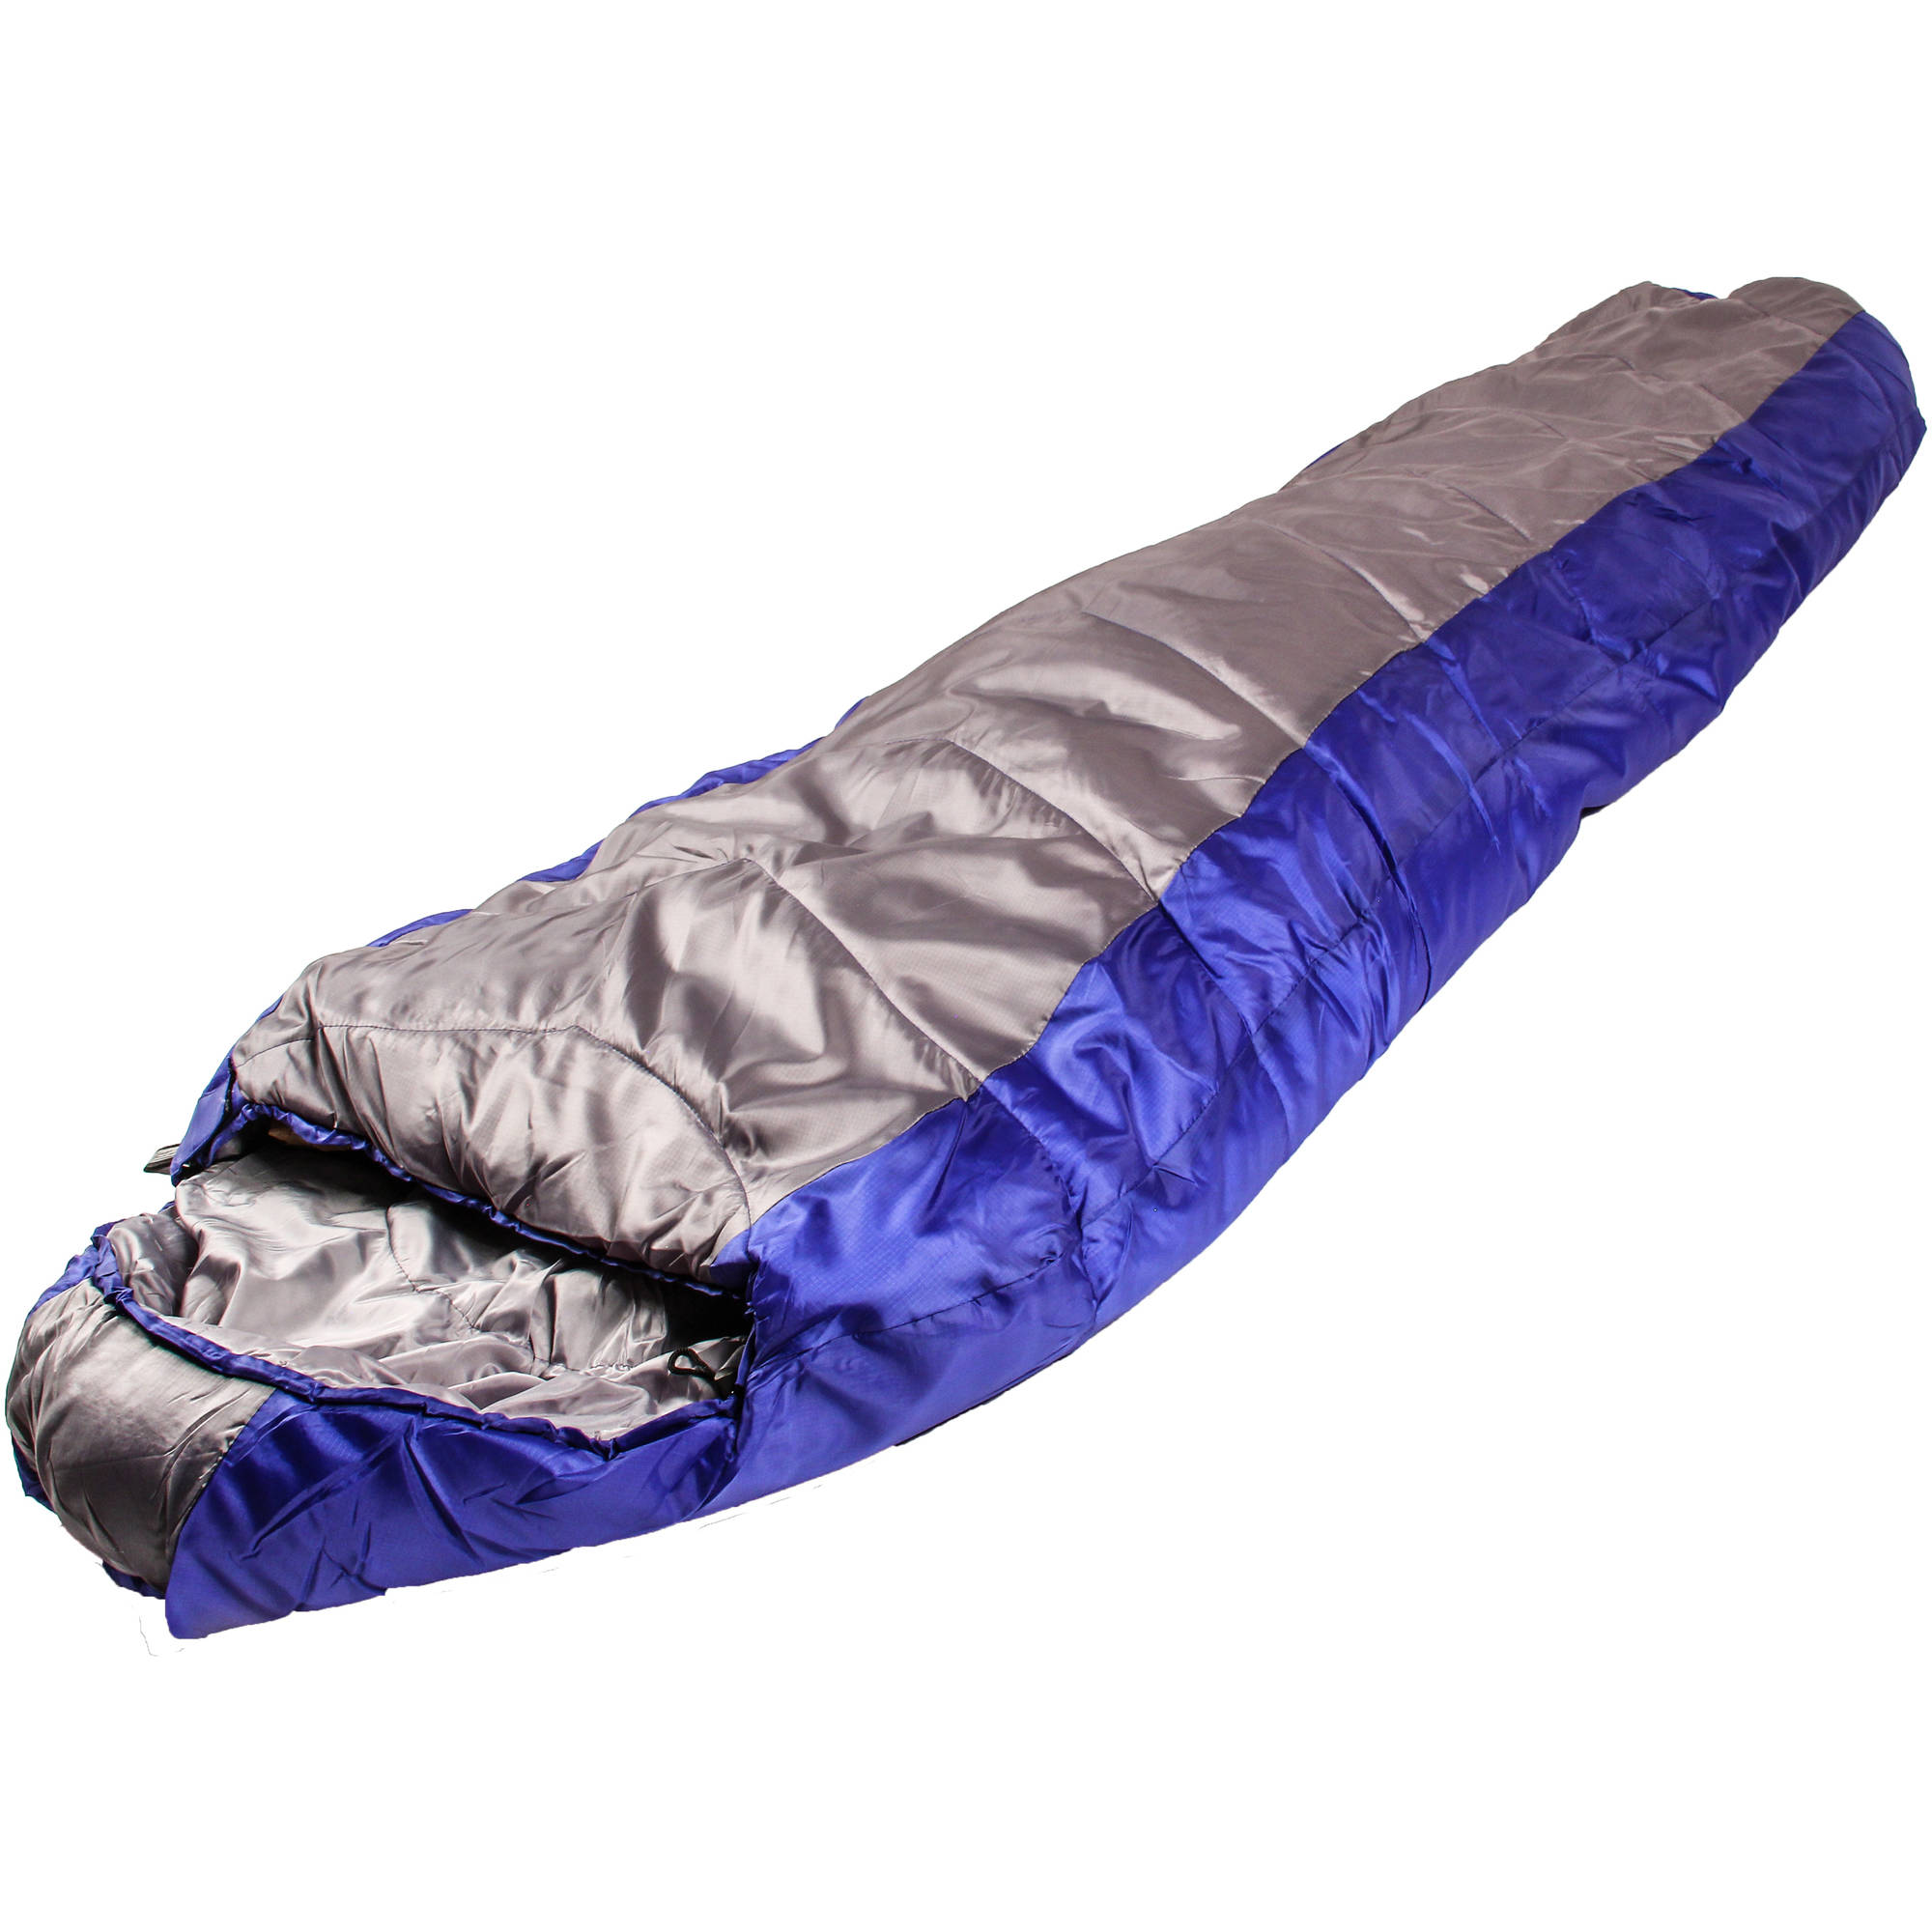 North Star CoreTech 25-Degree Adult Mummy Sleeping Bag, Blue/Gray